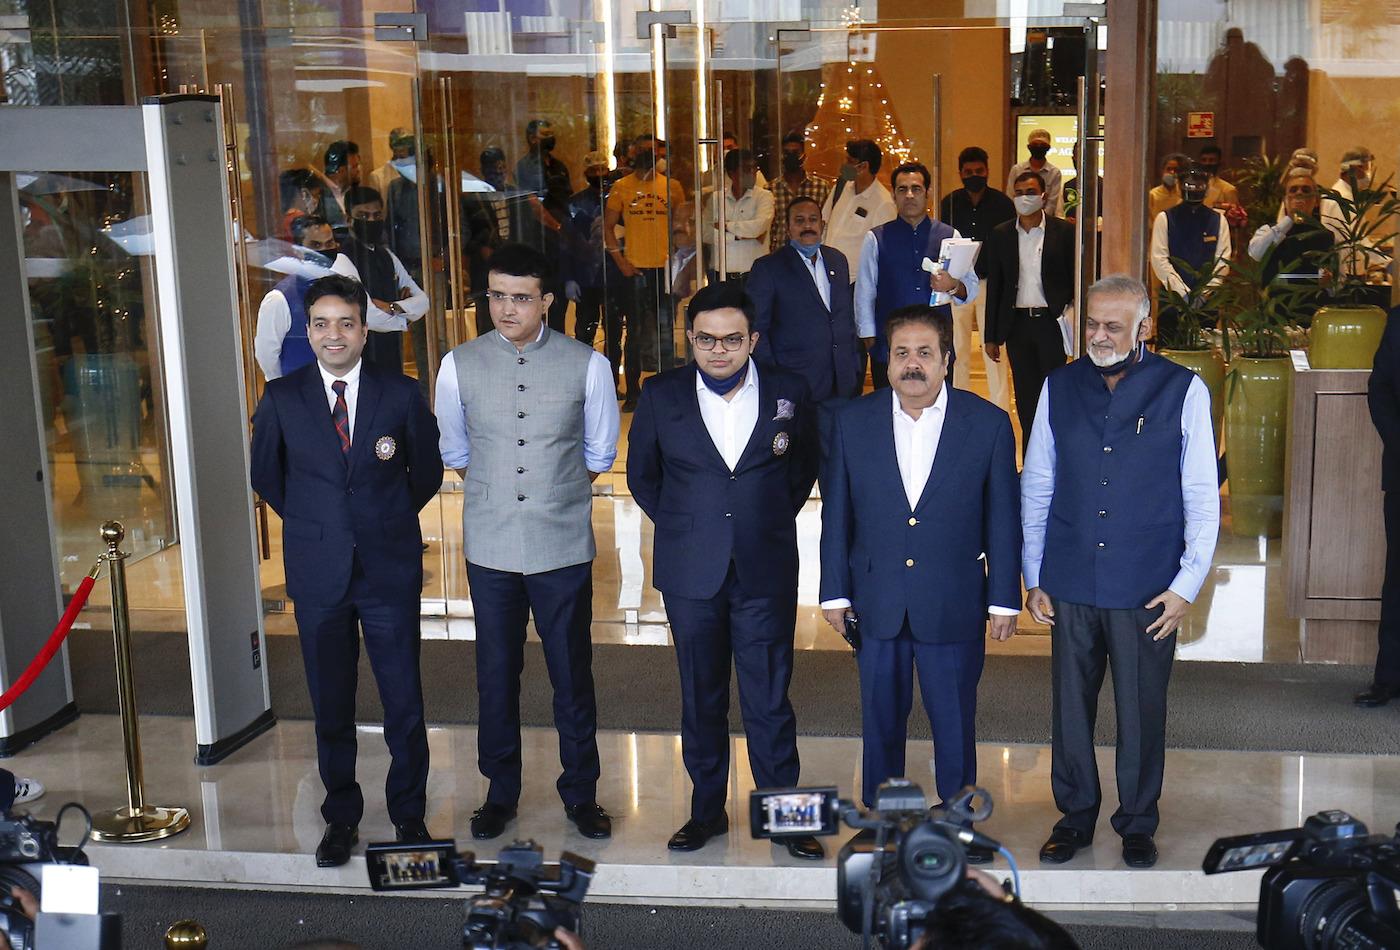 Arun Singh Dhumal, Sourav Ganguly, Jay Shah, Rajeev Shukla, and Brajesh Patel at the 89th BCCI AGM in Ahemadabad